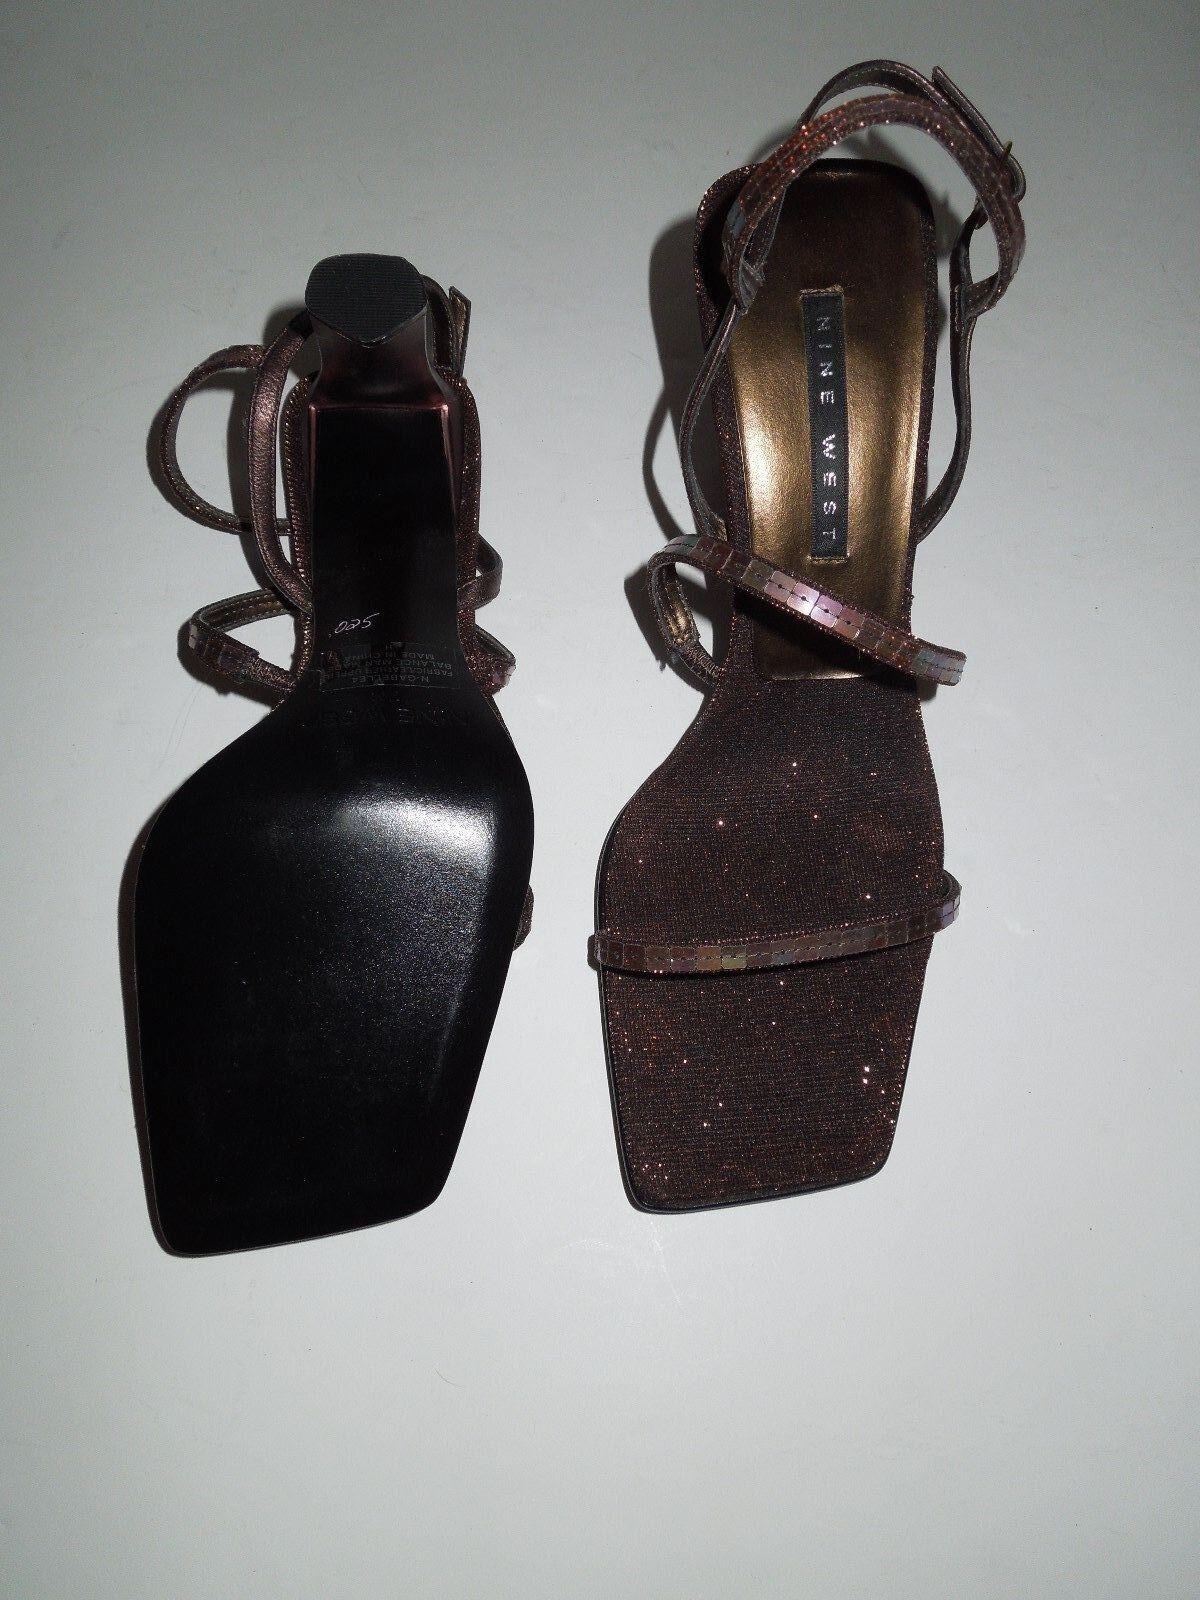 NWOT Metallic Nine West N-Gabelle4 Metallic NWOT Bronze Leather AB Sequin Gladiator Sandals 7M b18ff3